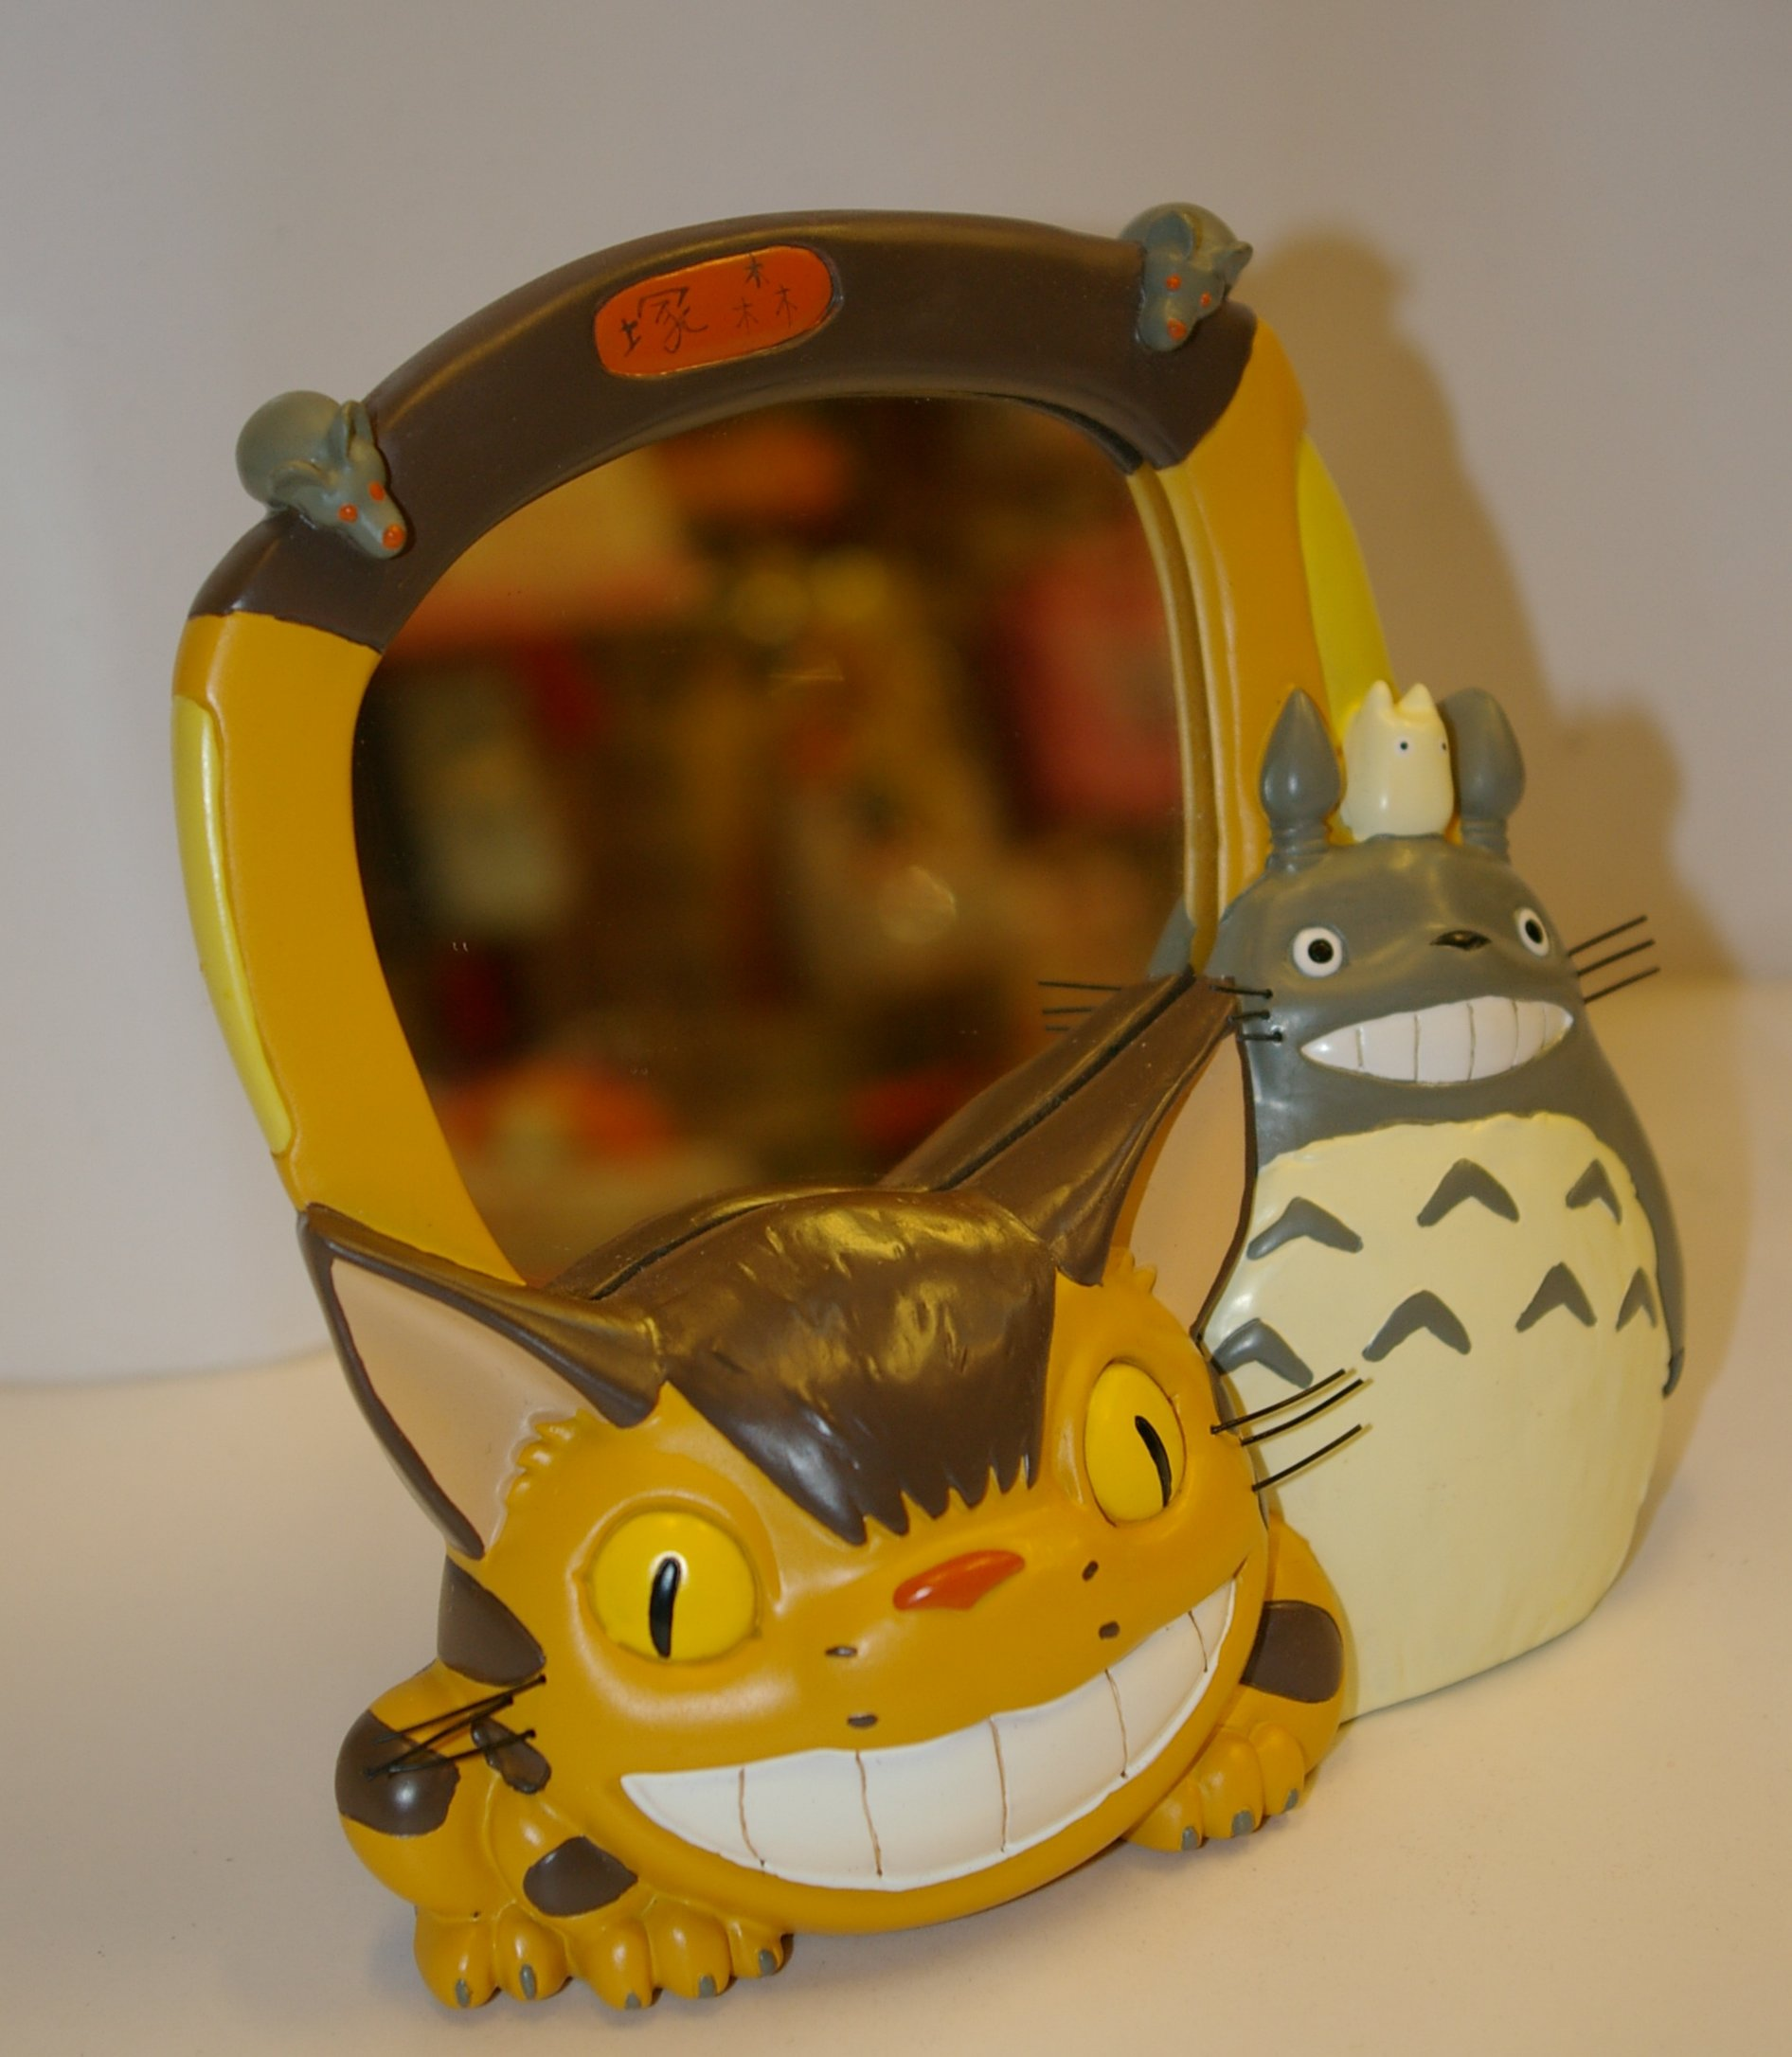 Face du Miroir Totoro